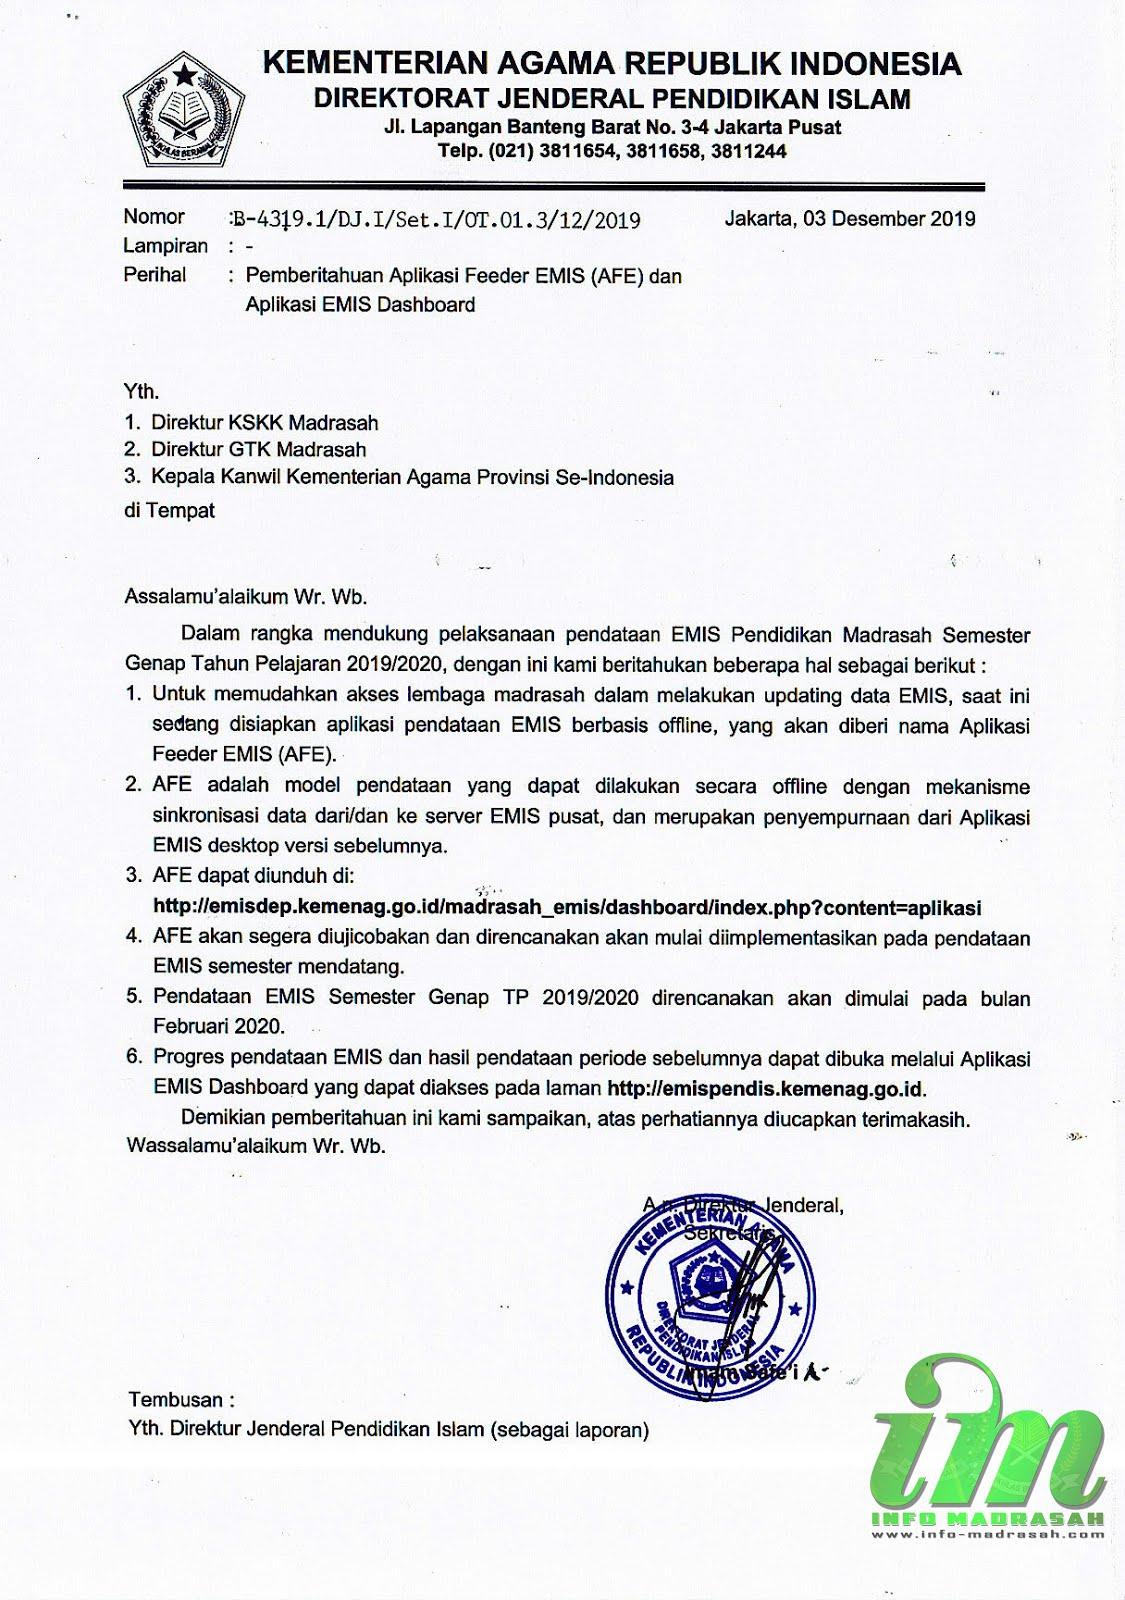 Emis Manajemen Un Ma : manajemen, Surat, Pemberitahuan, Aplikasi, Feeder, (AFE), Dashboard, Madrasah